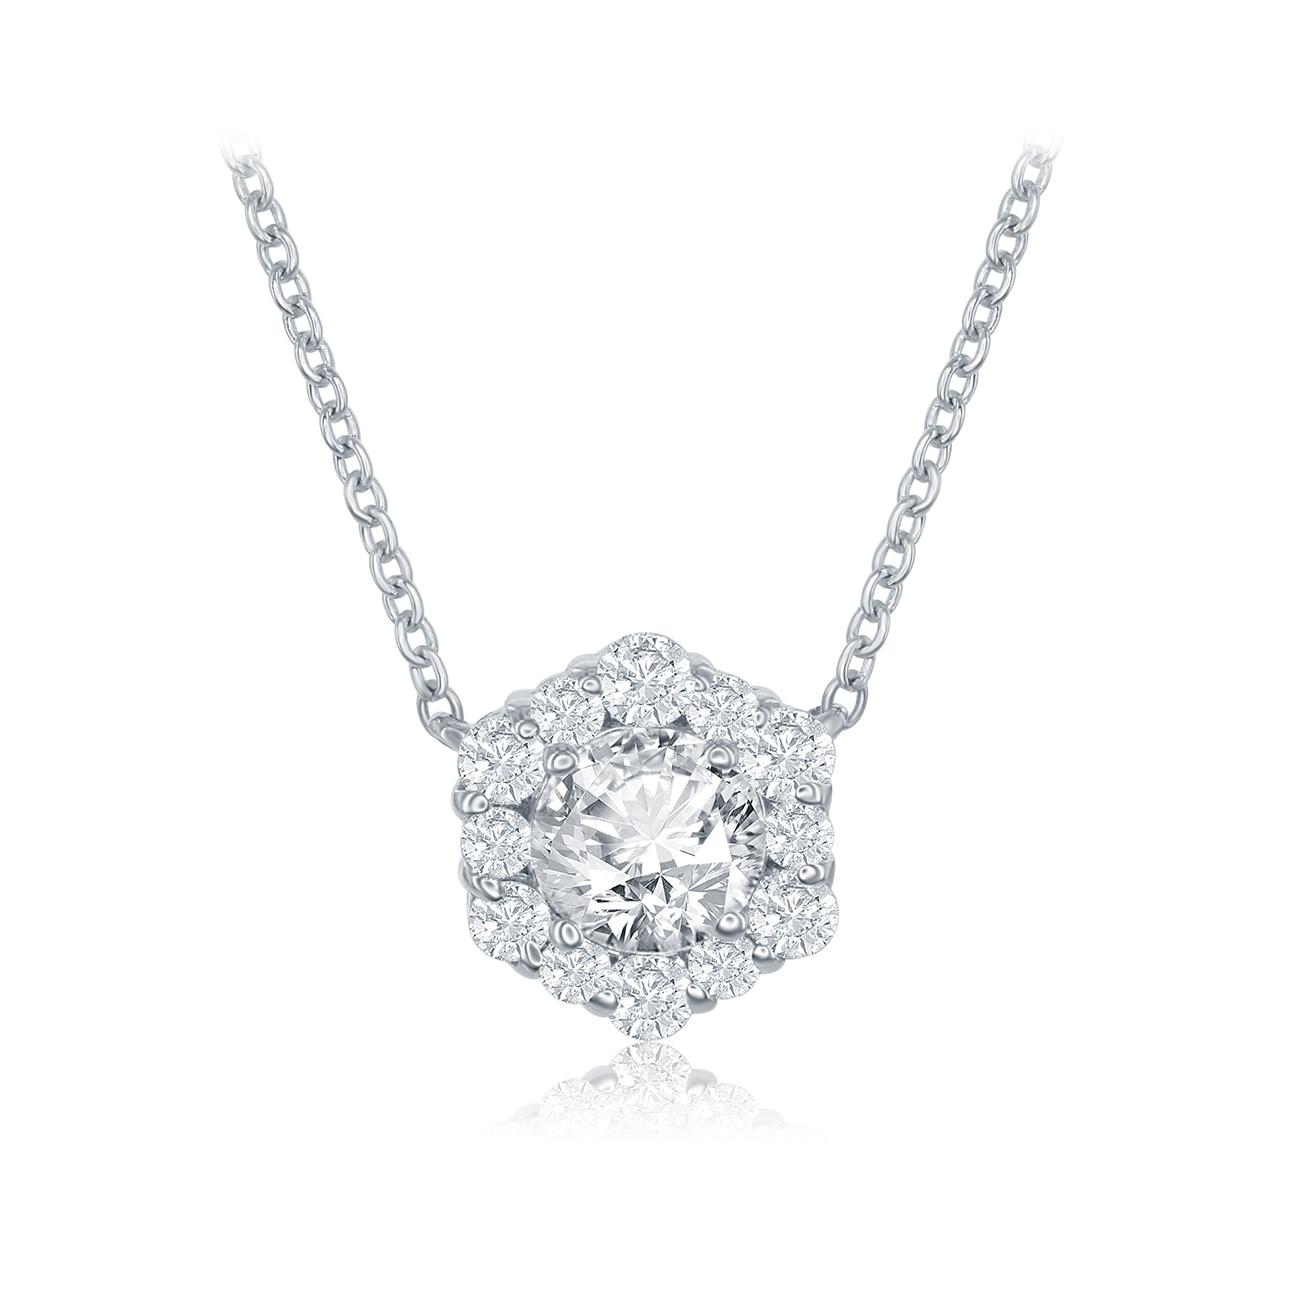 Round shape diamond necklaces forevermark integre single halo pendant aloadofball Image collections